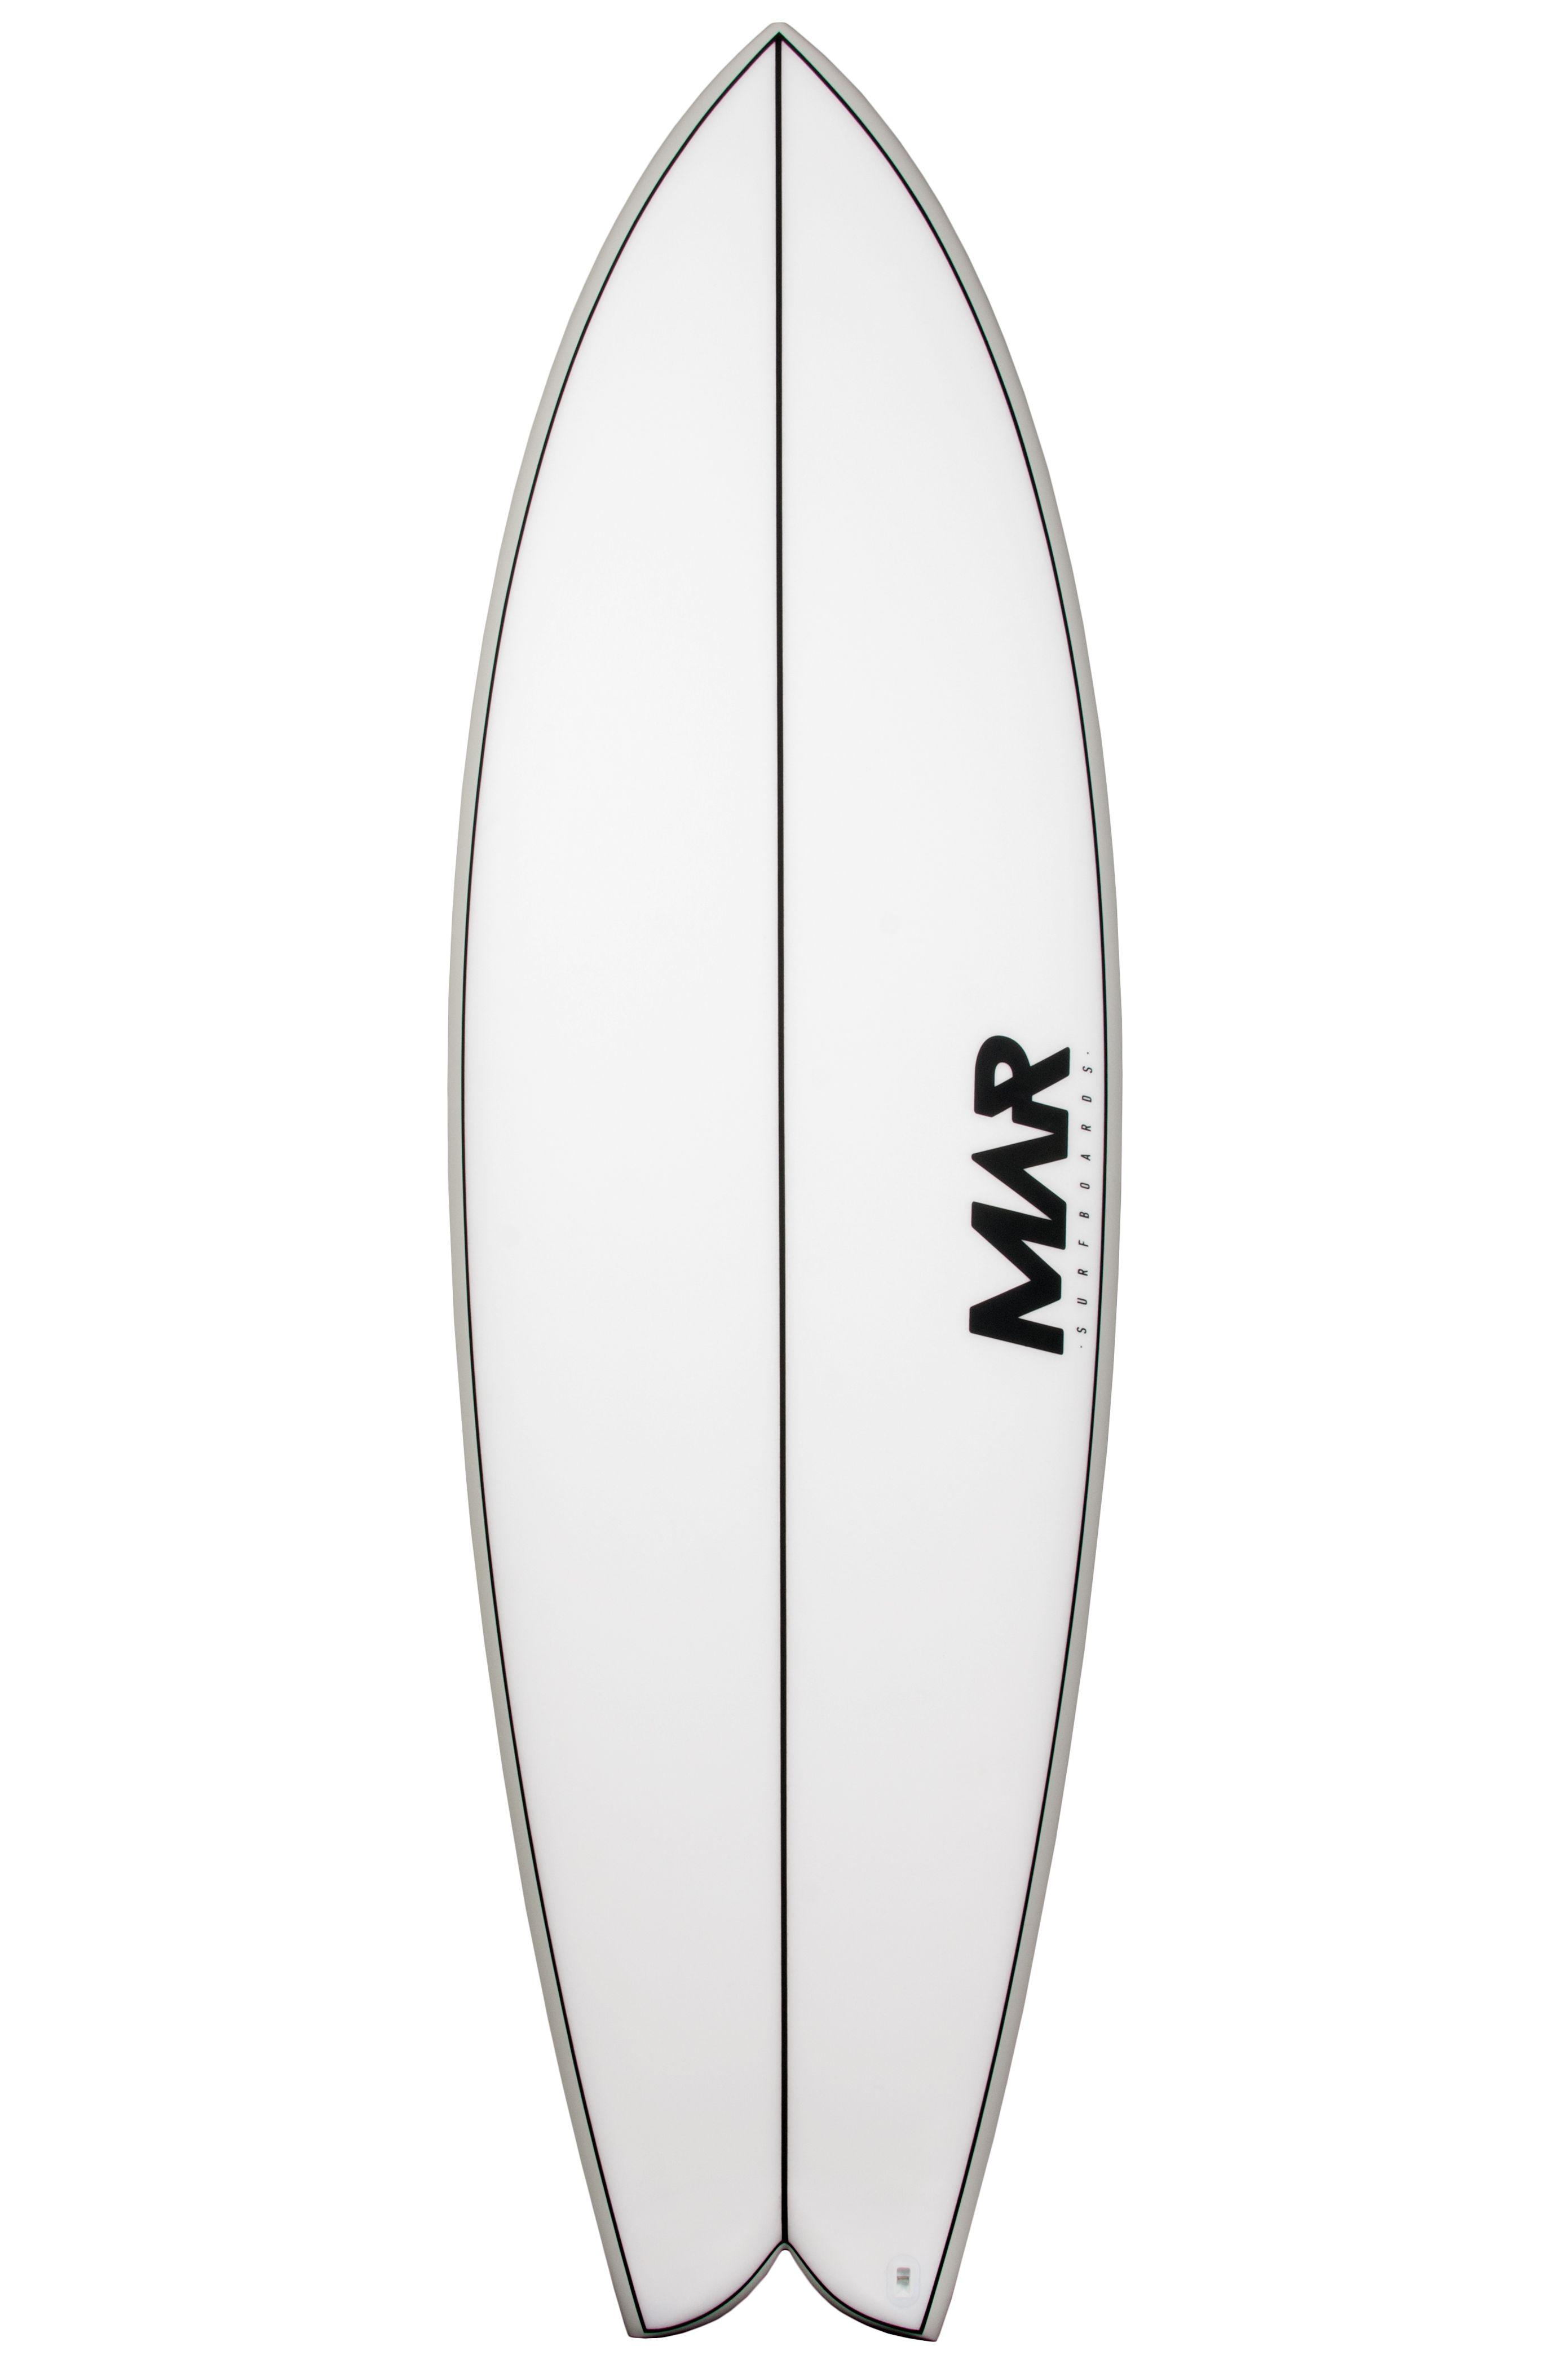 Mar Surf Board 5'10 MAR P2 XE Fish Tail - White FCS II Twin Tab 5ft10